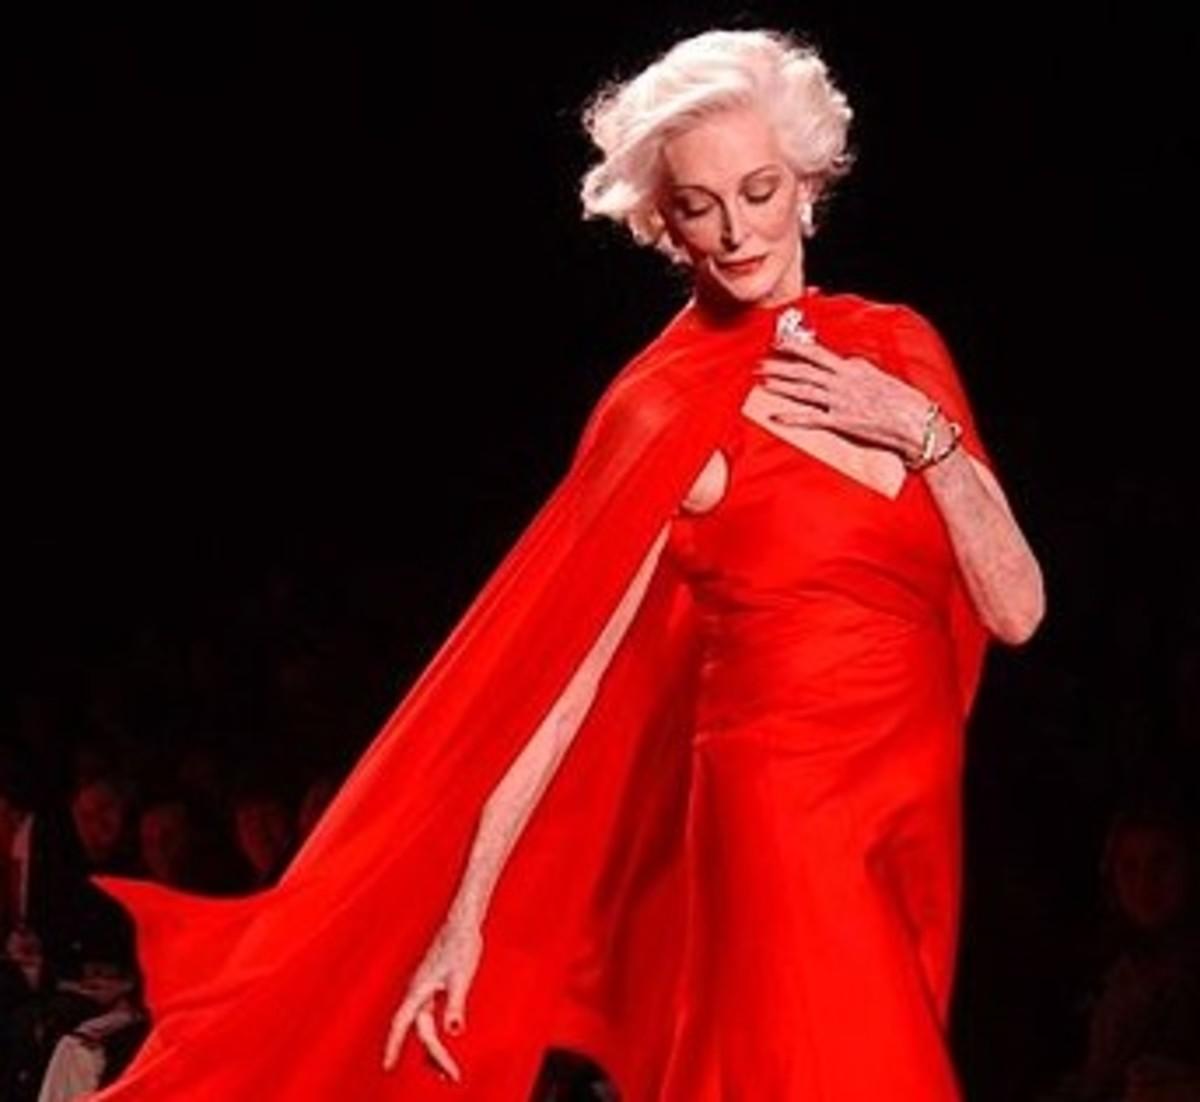 Carmen at age 74.